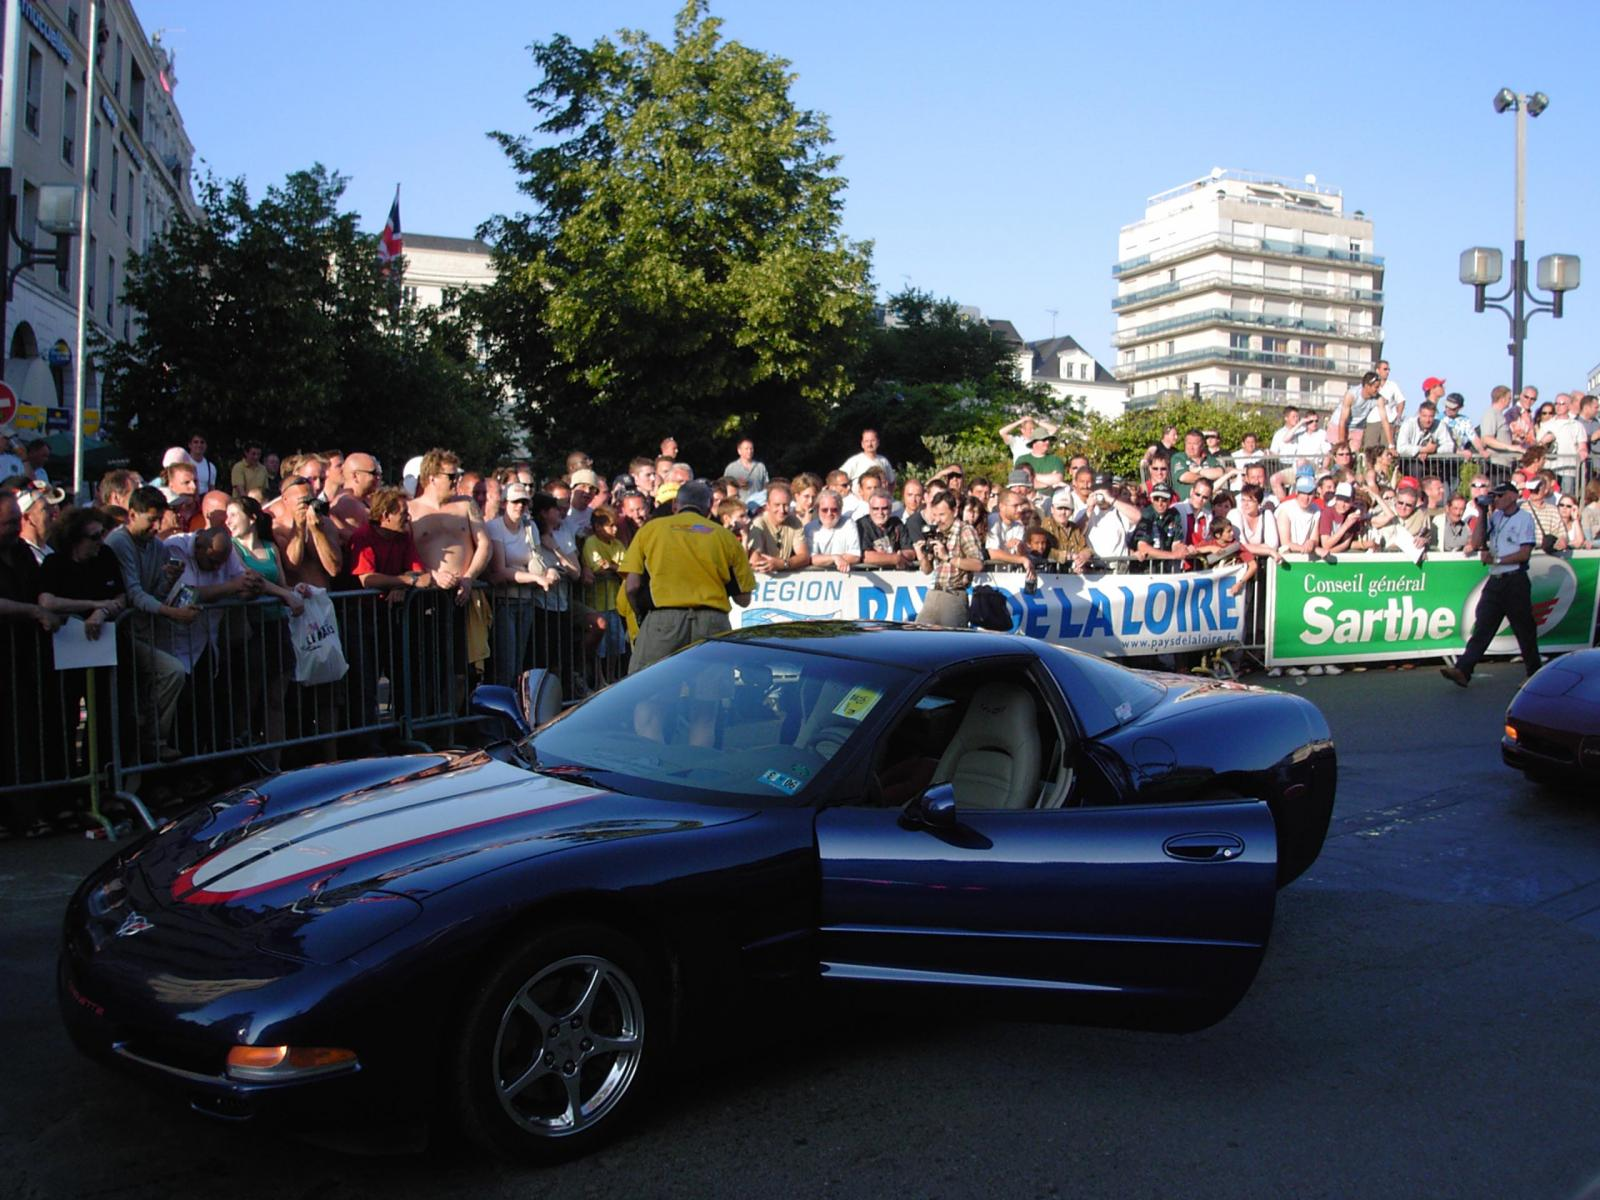 Le mans 2005 parade 01.jpg